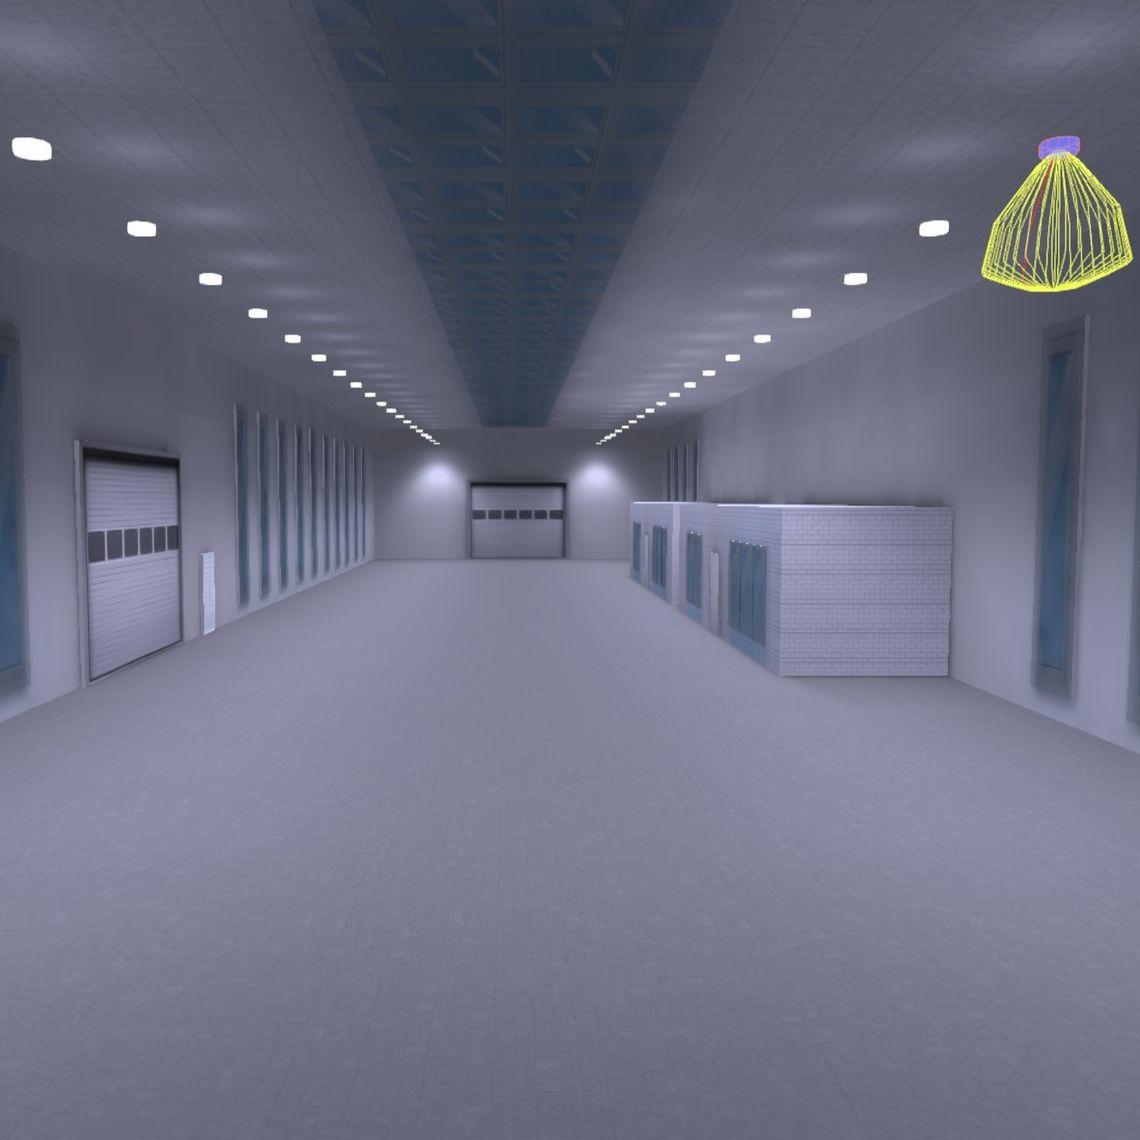 Bur Lighting Bunte Und Remmler Lichtplanungen Led Beleuchtung Montage Lichtplanung Lichtdesign Beleuchtung